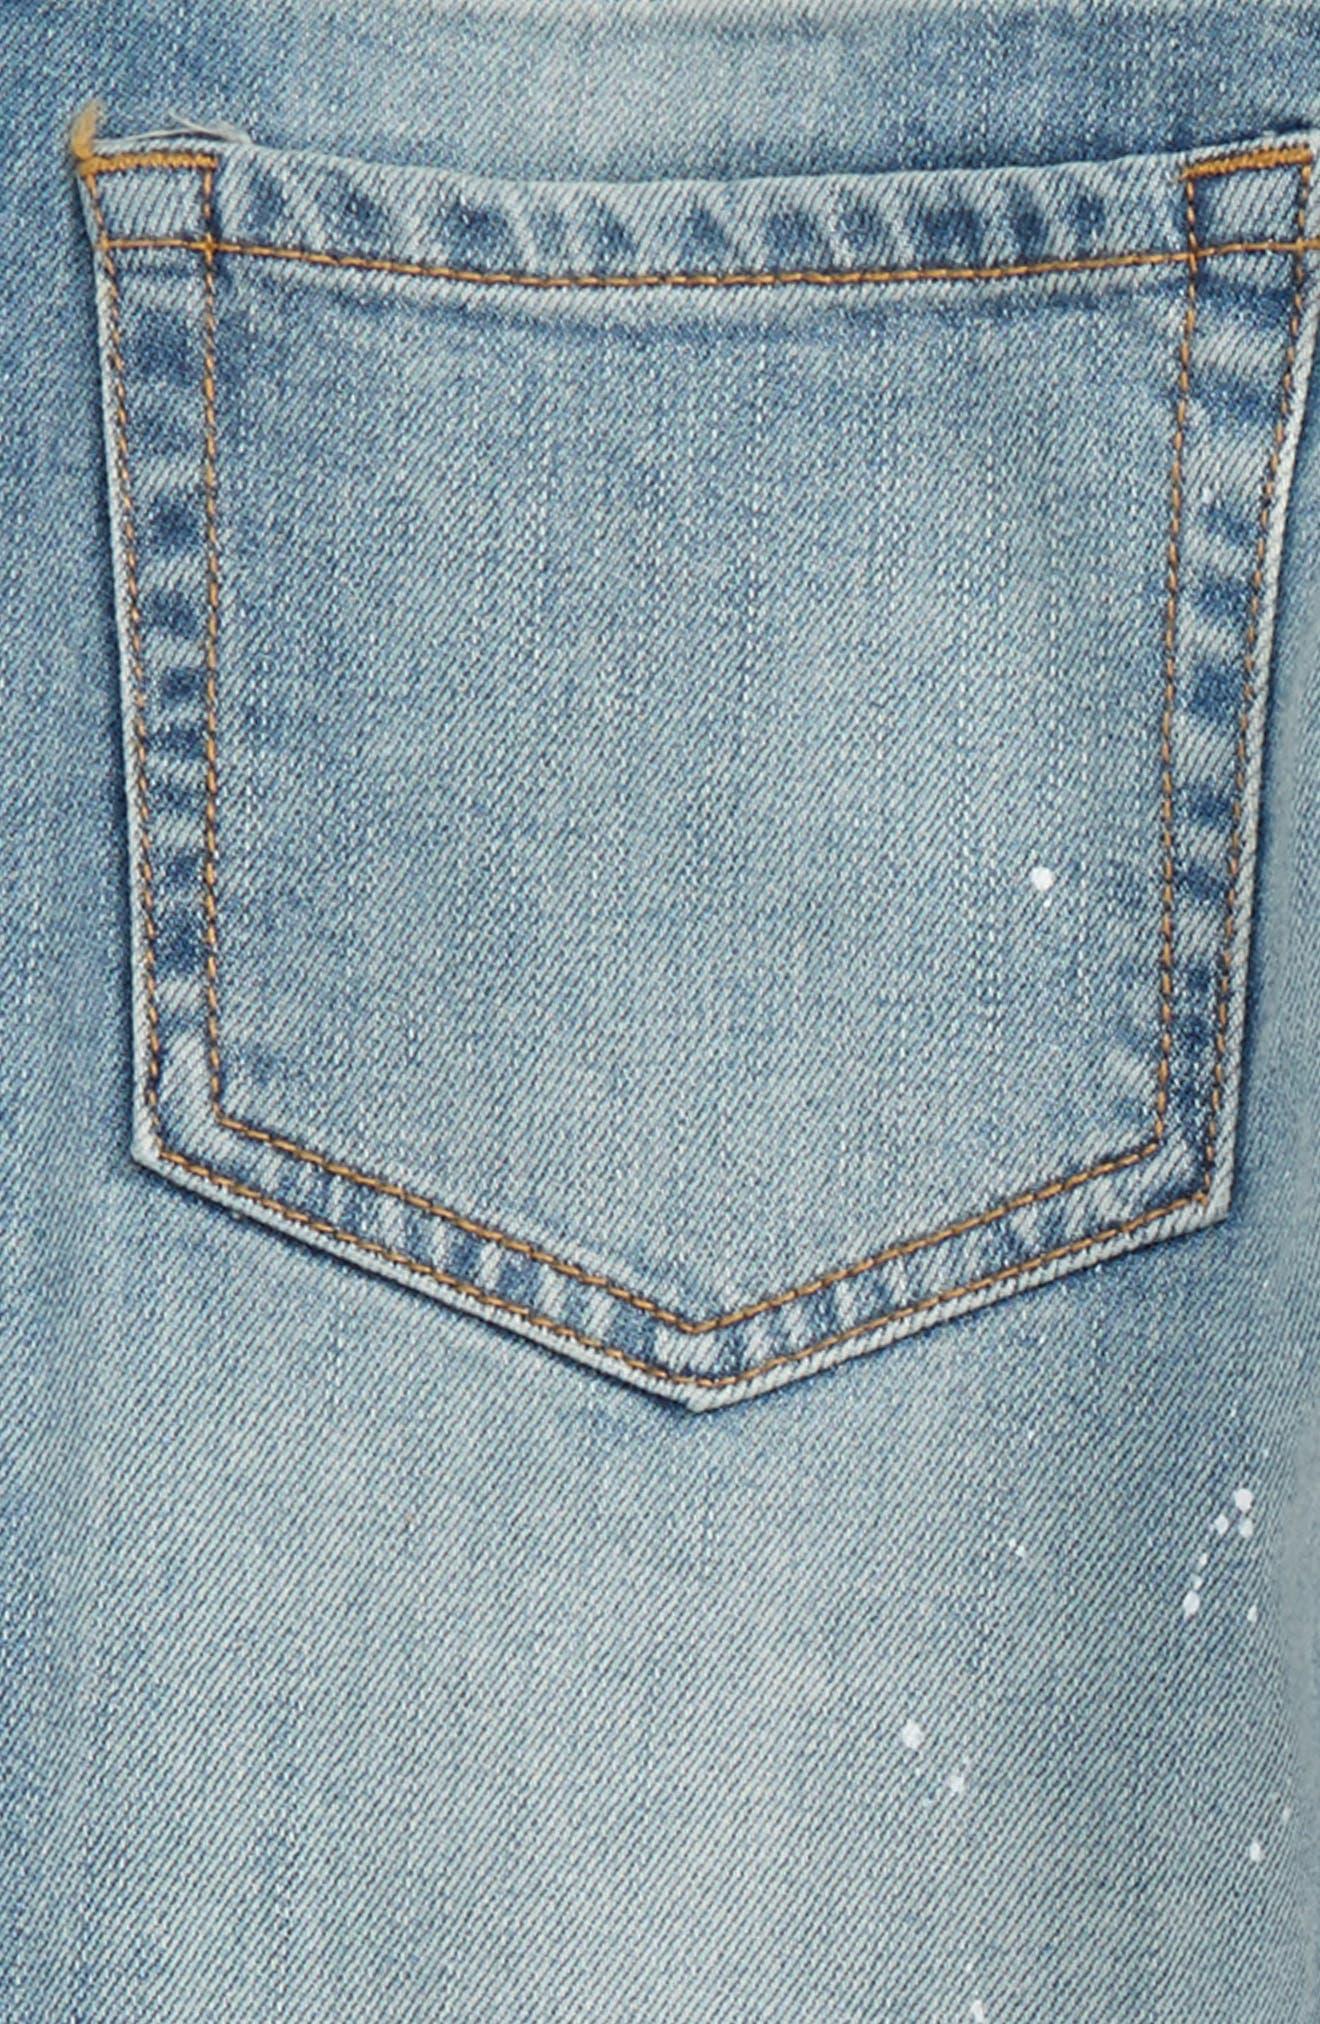 Crop Distressed Girlfriend Jeans,                             Alternate thumbnail 3, color,                             450